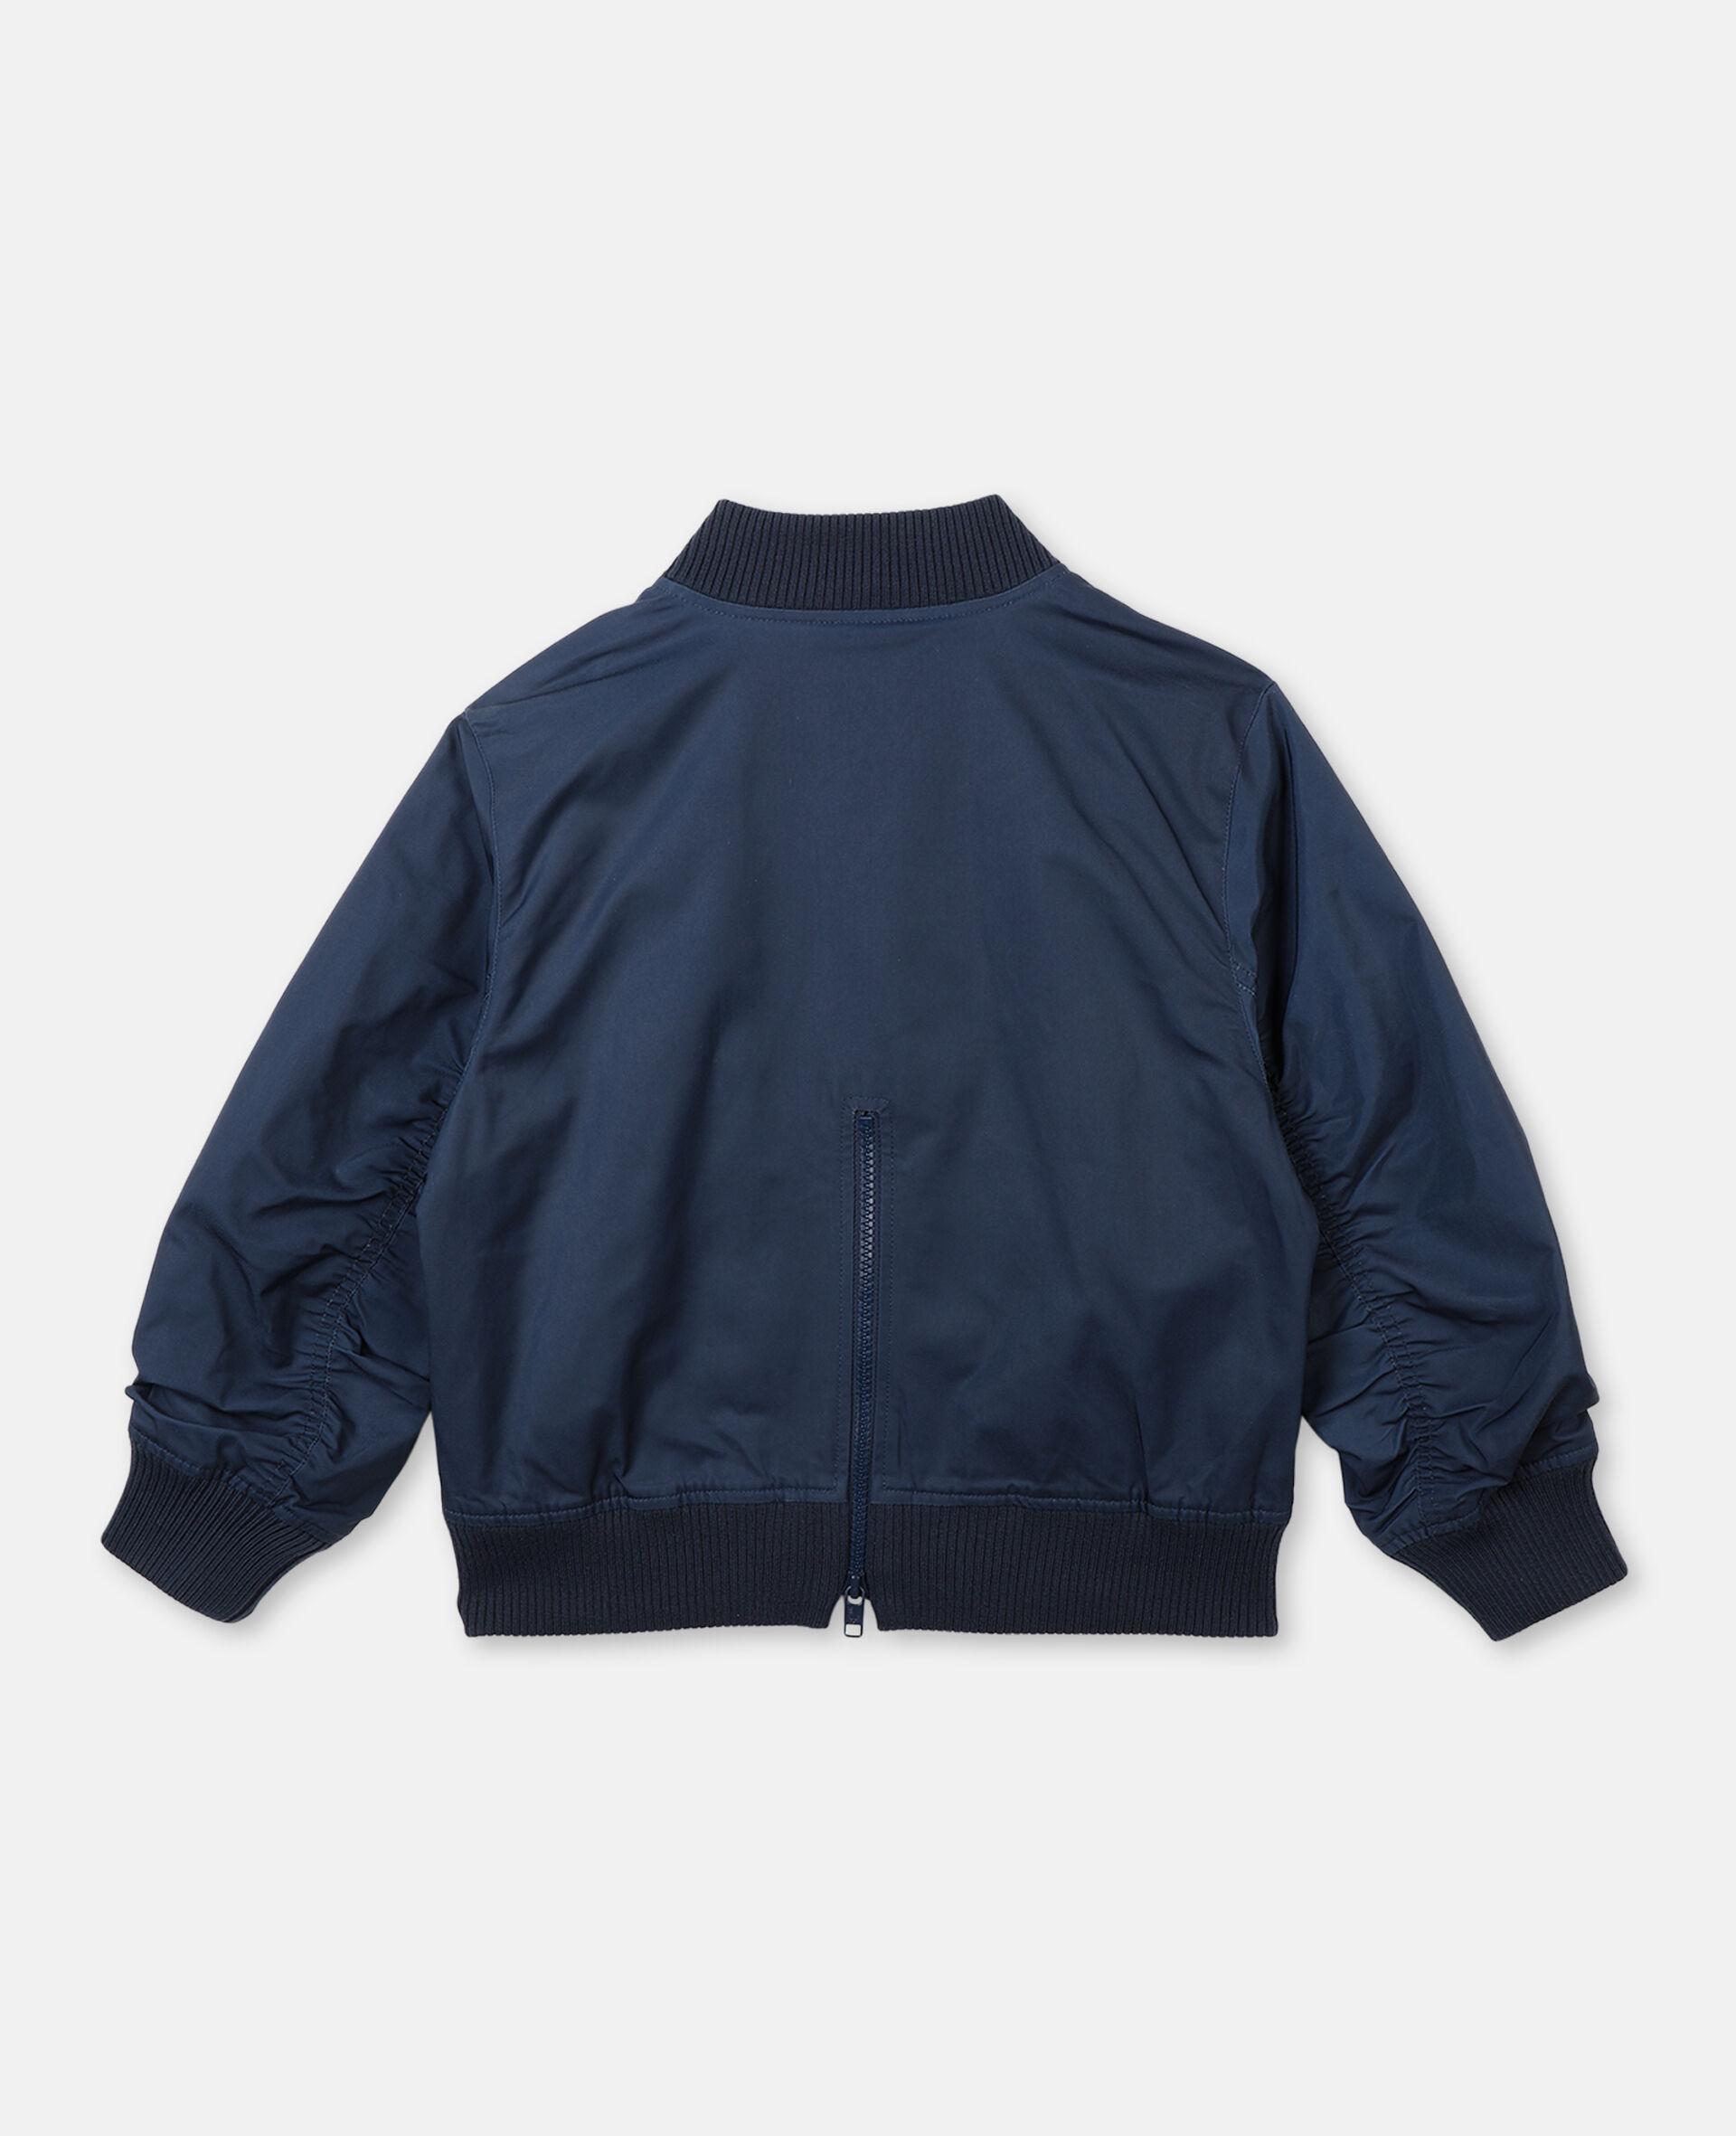 Embroidered Palms Jacket -Blue-large image number 3